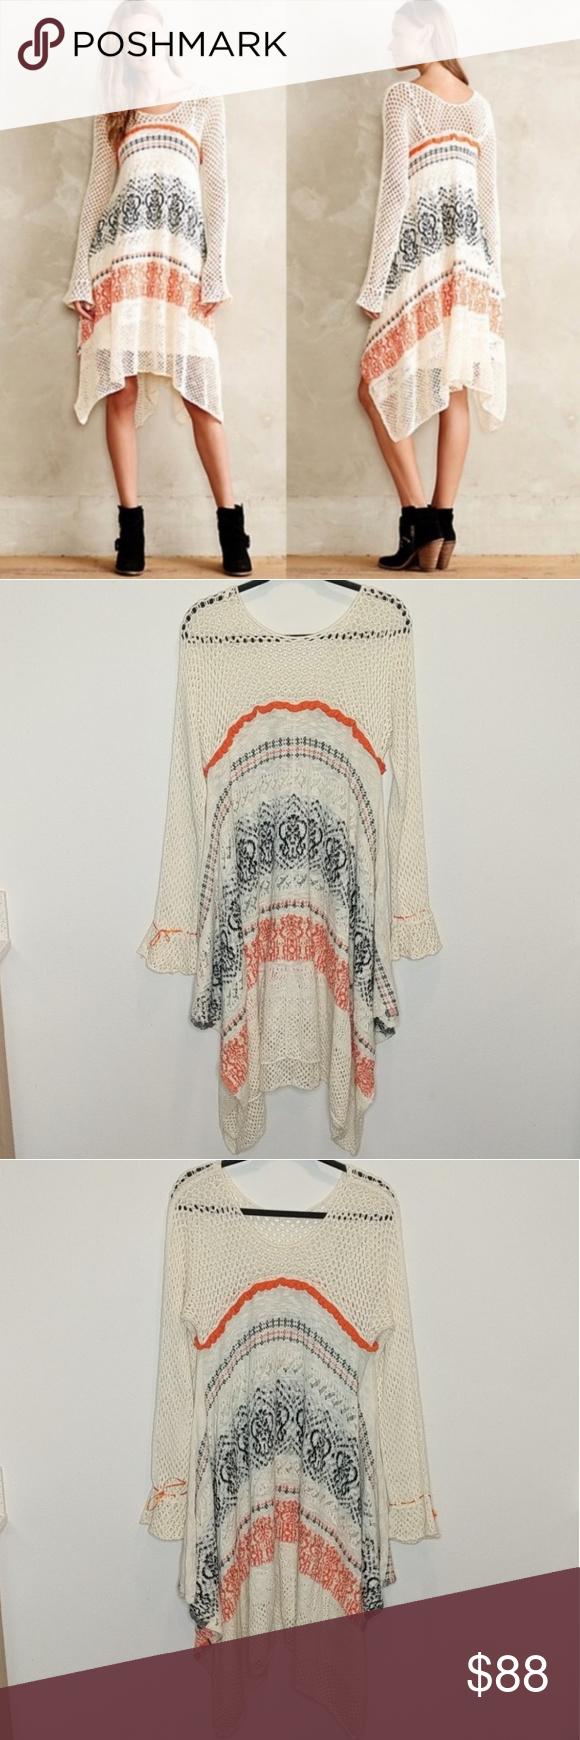 23+ Anthropologie risen sun sweater dress ideas in 2021